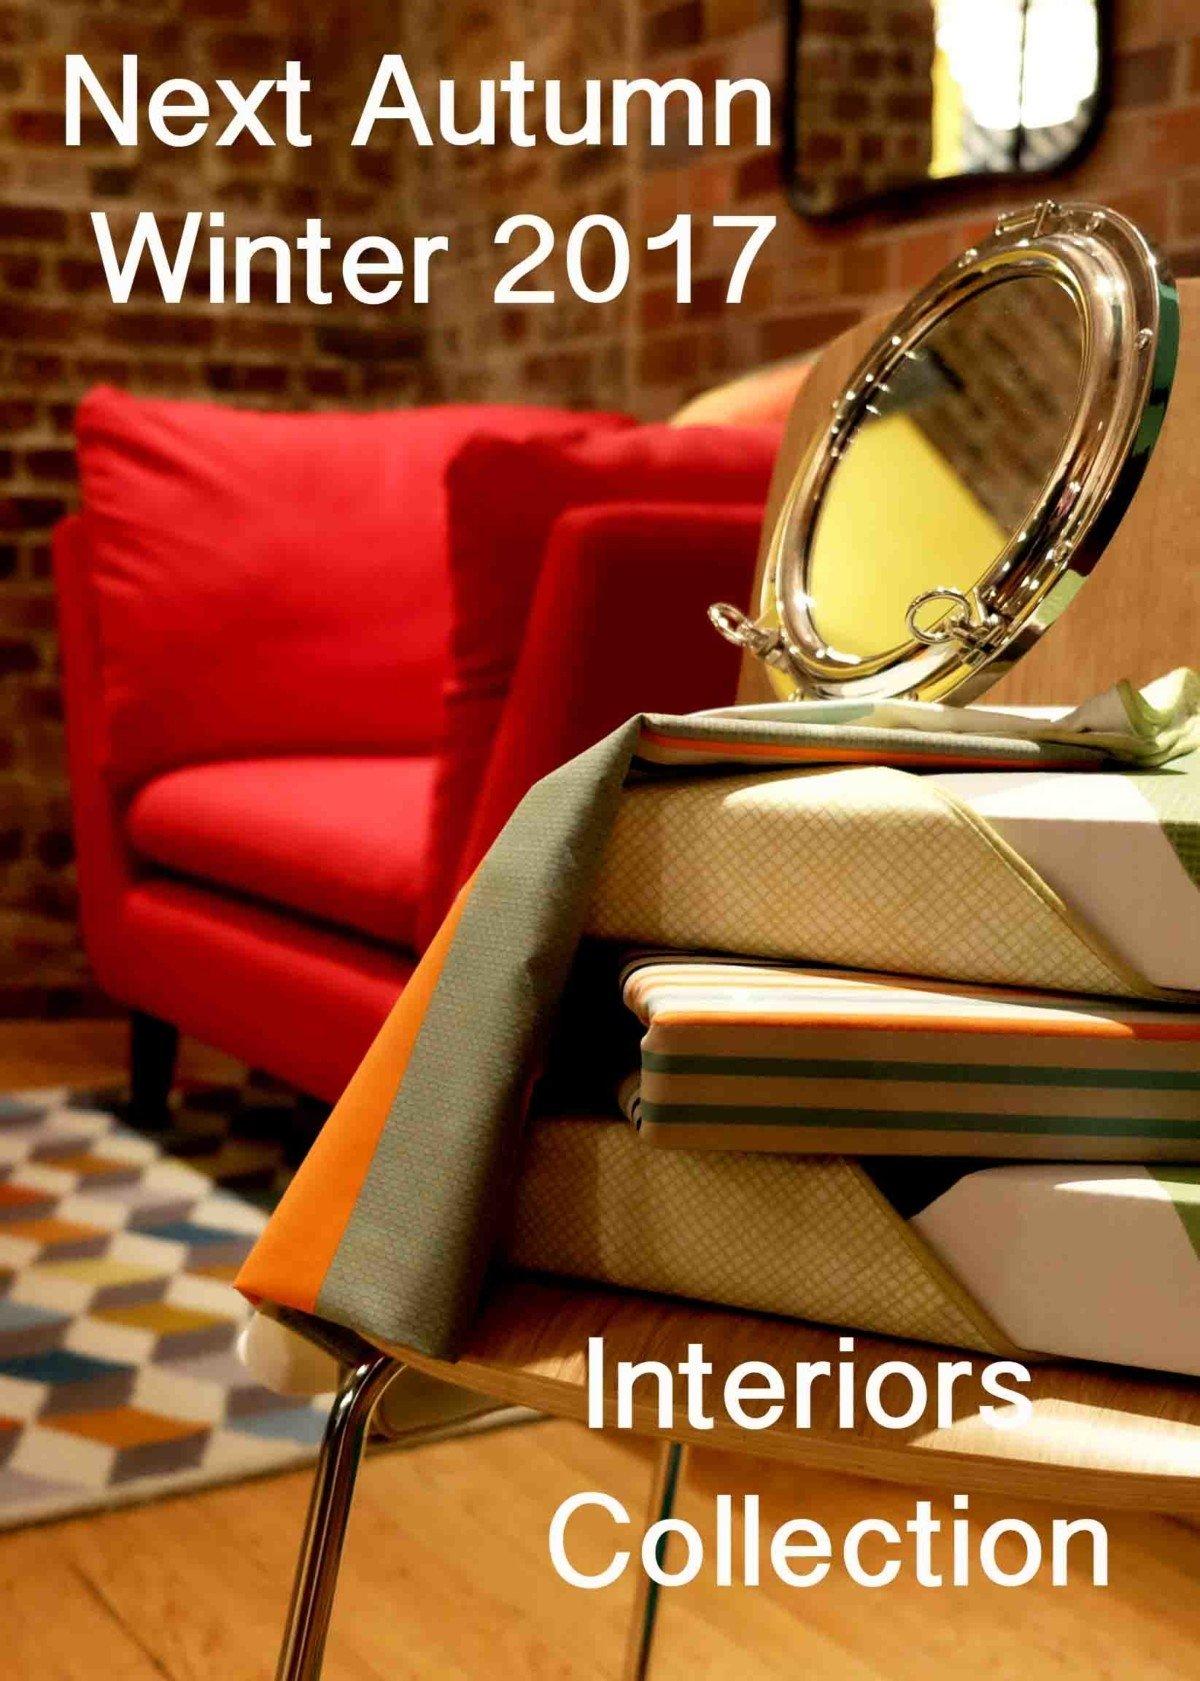 Next Autumn Winter 2017 Interiors Collection